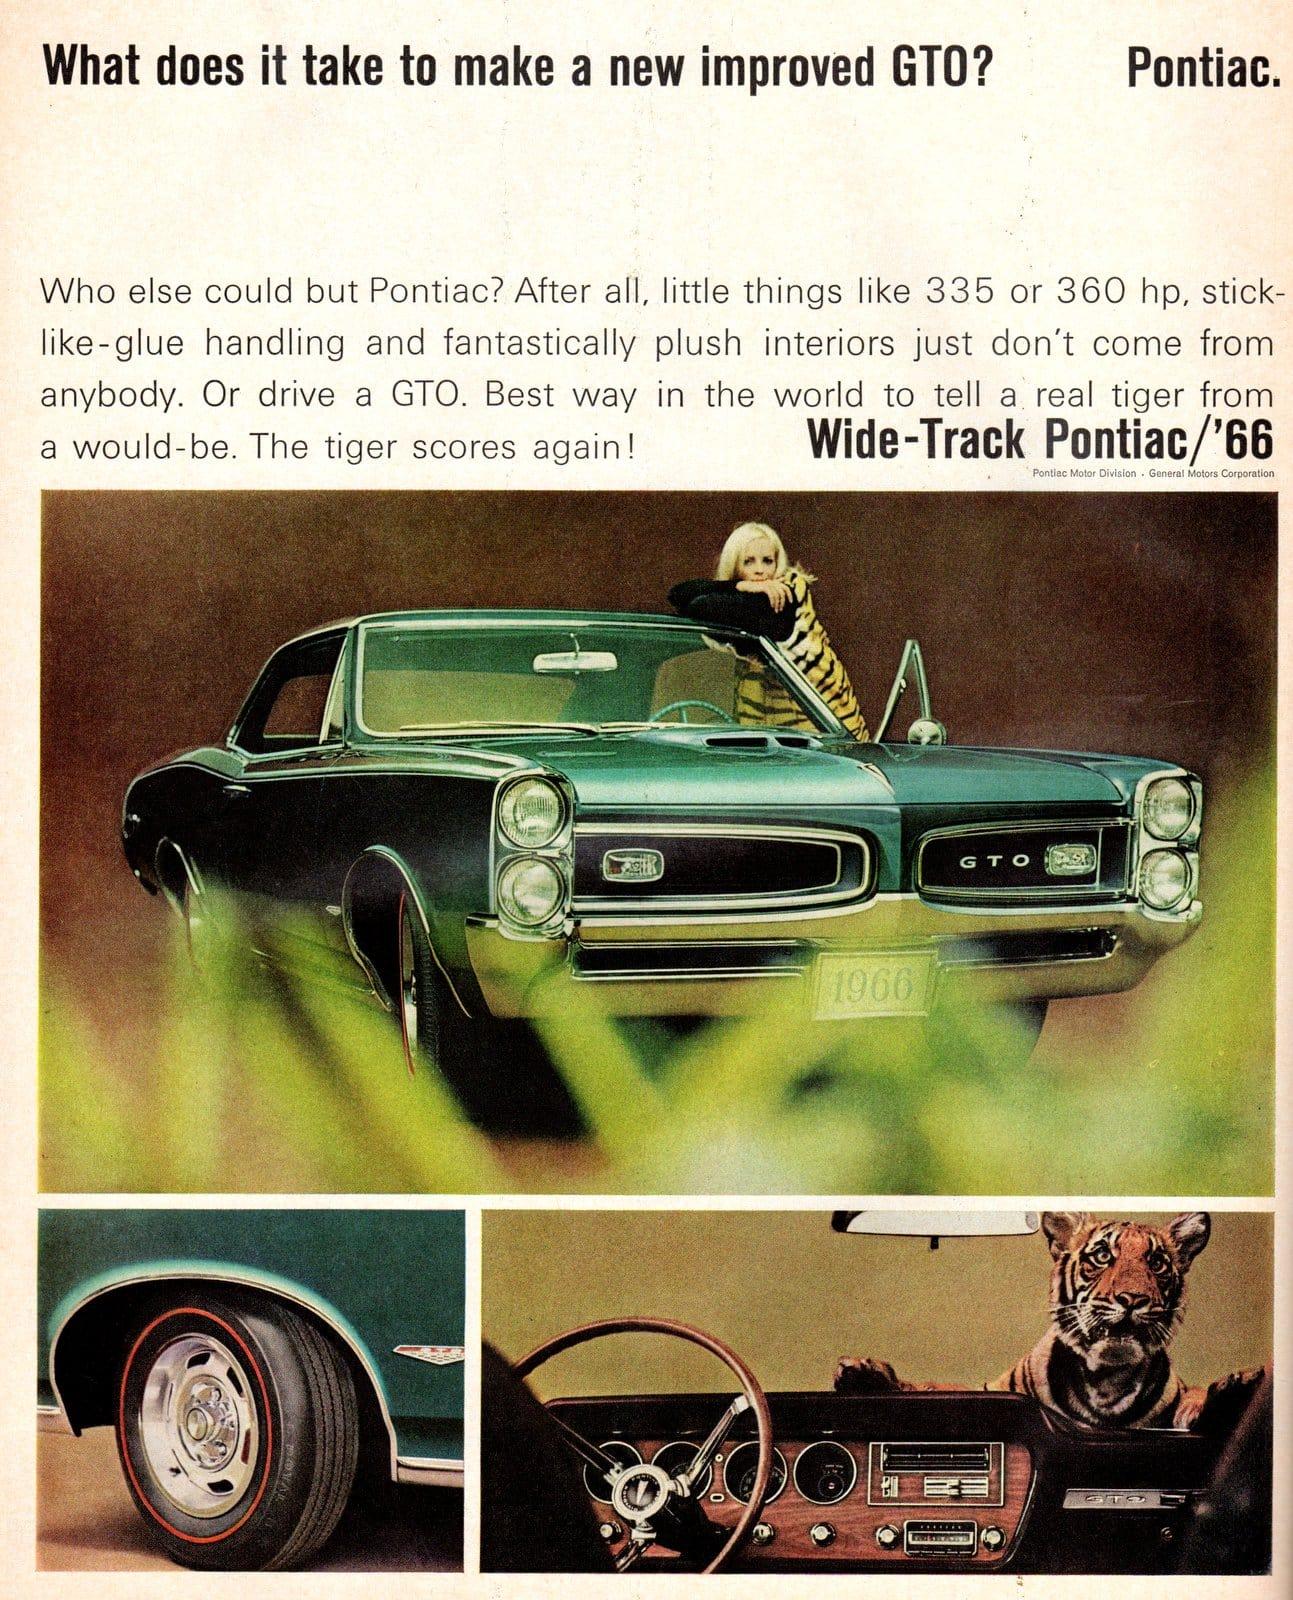 Wide-Track Pontiac GTO 1966